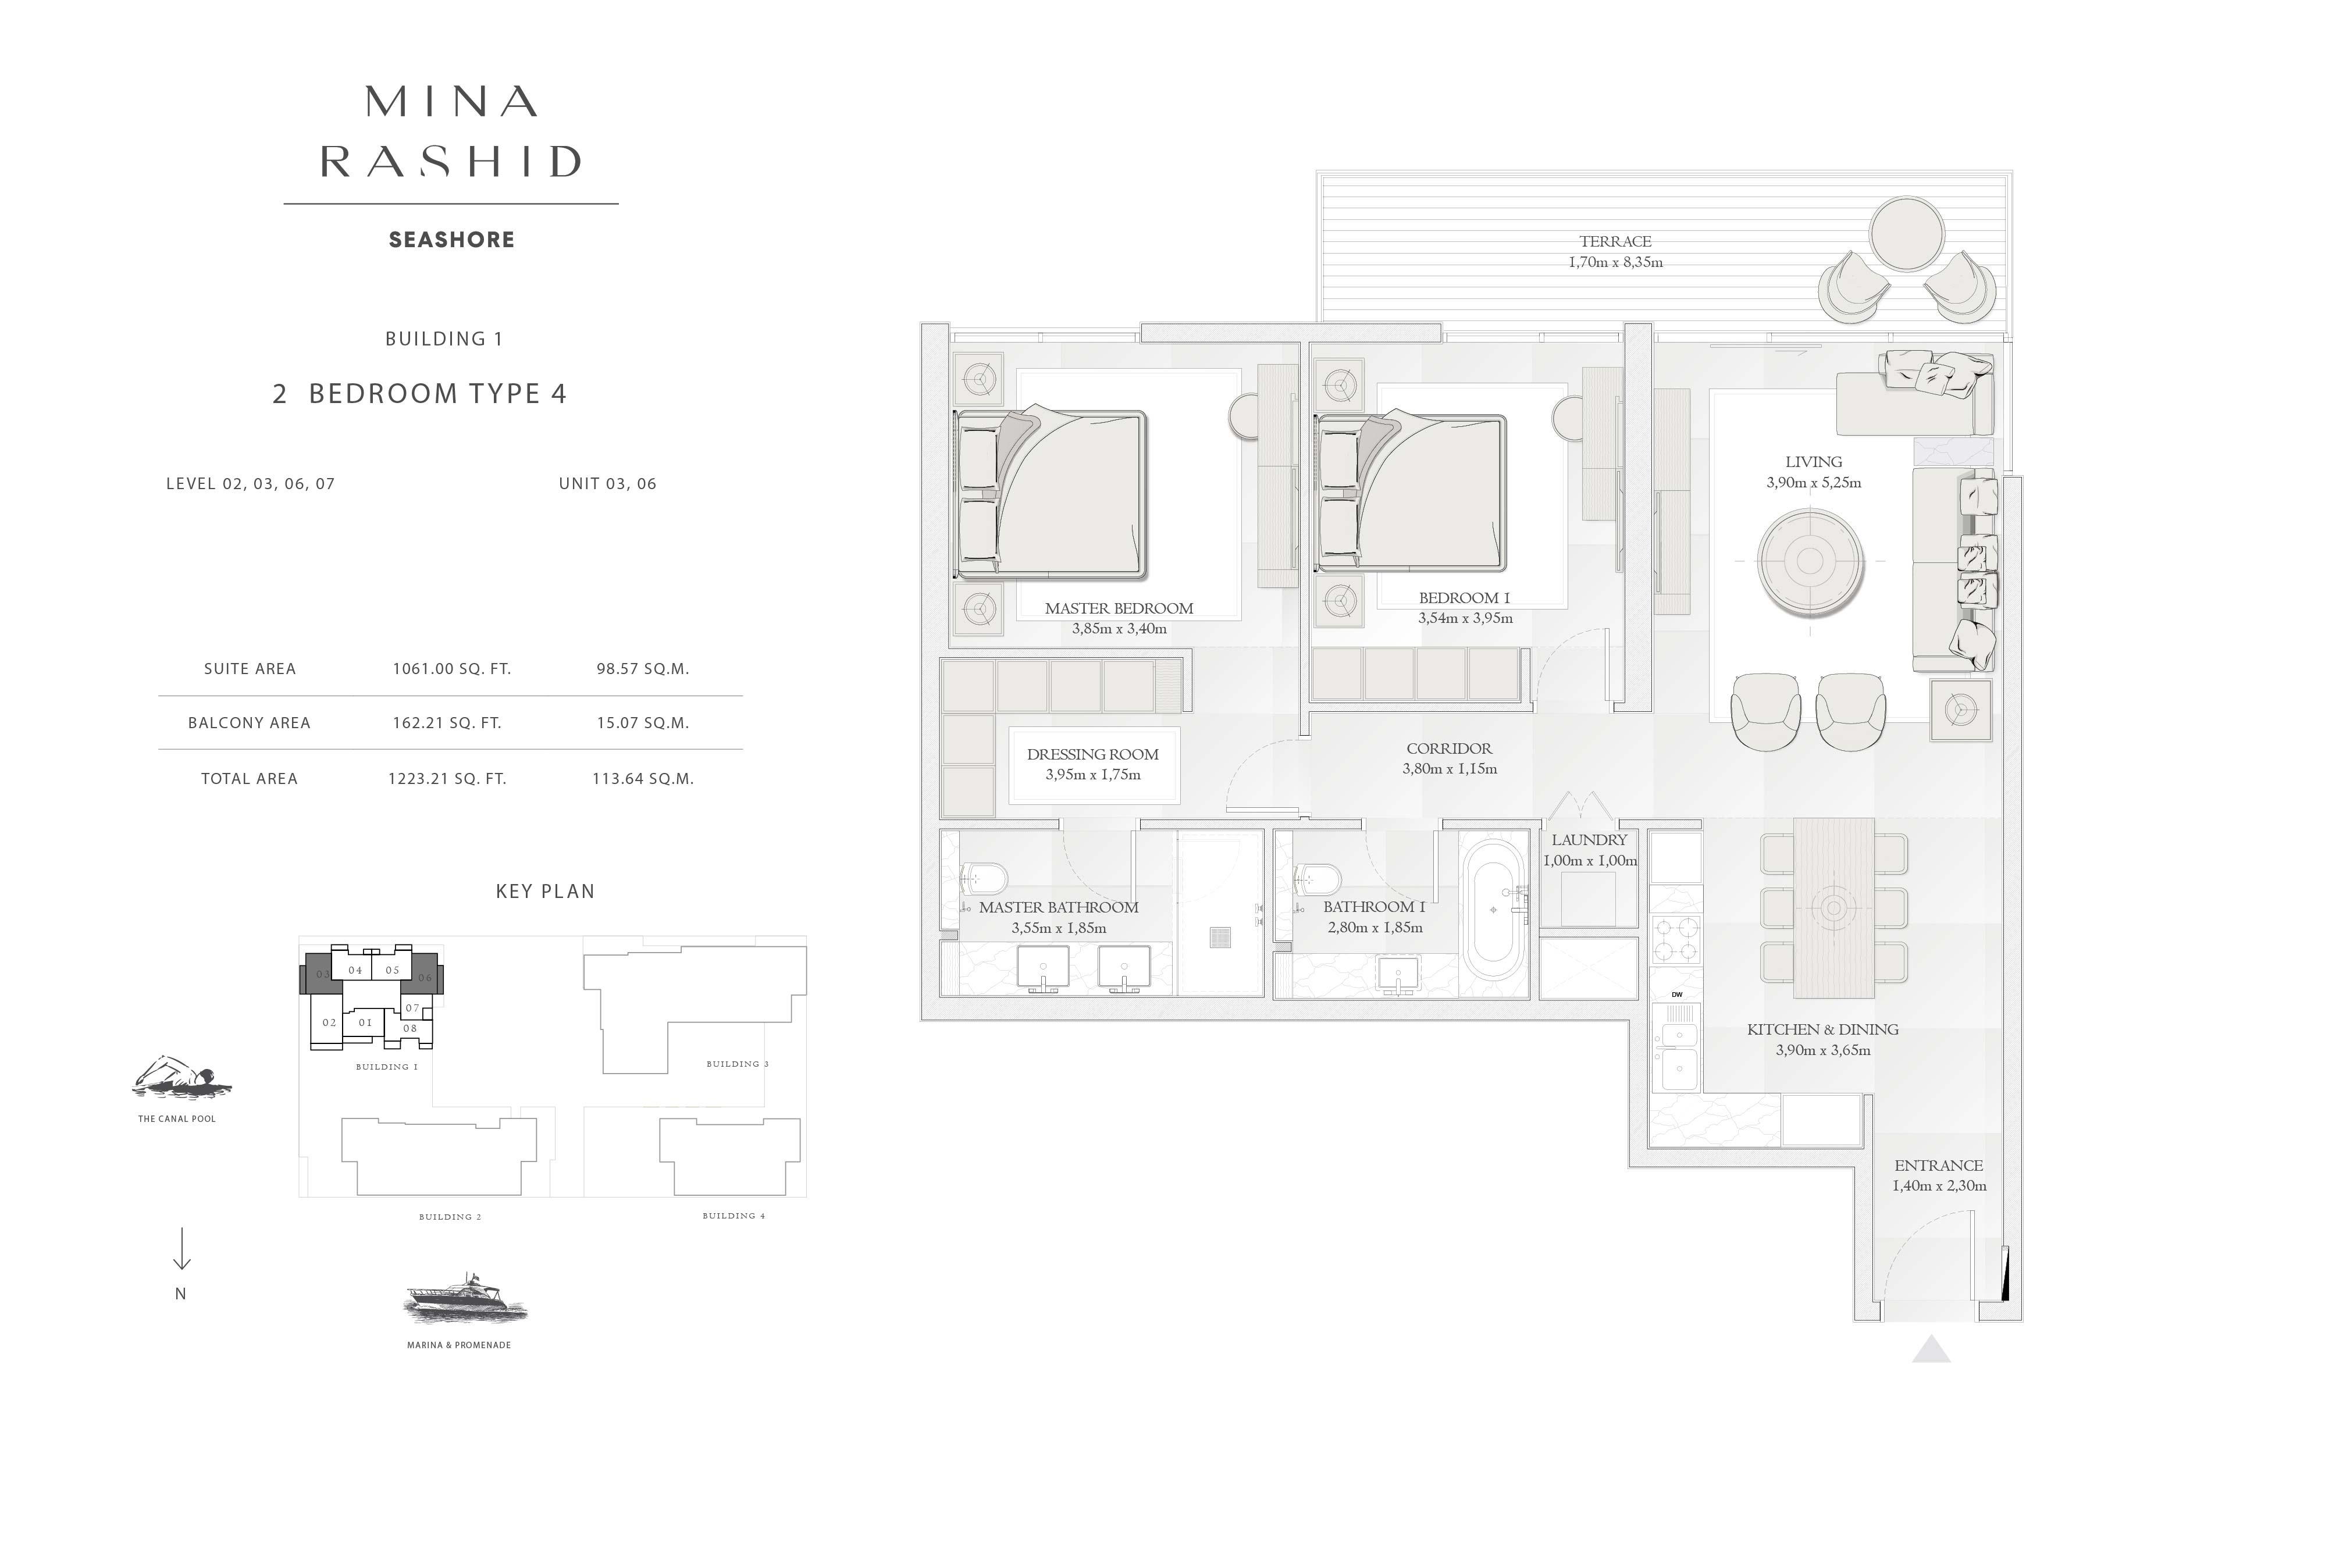 Building-1, 2-Bedroom-Type-4, Size-1223-Sq-Ft